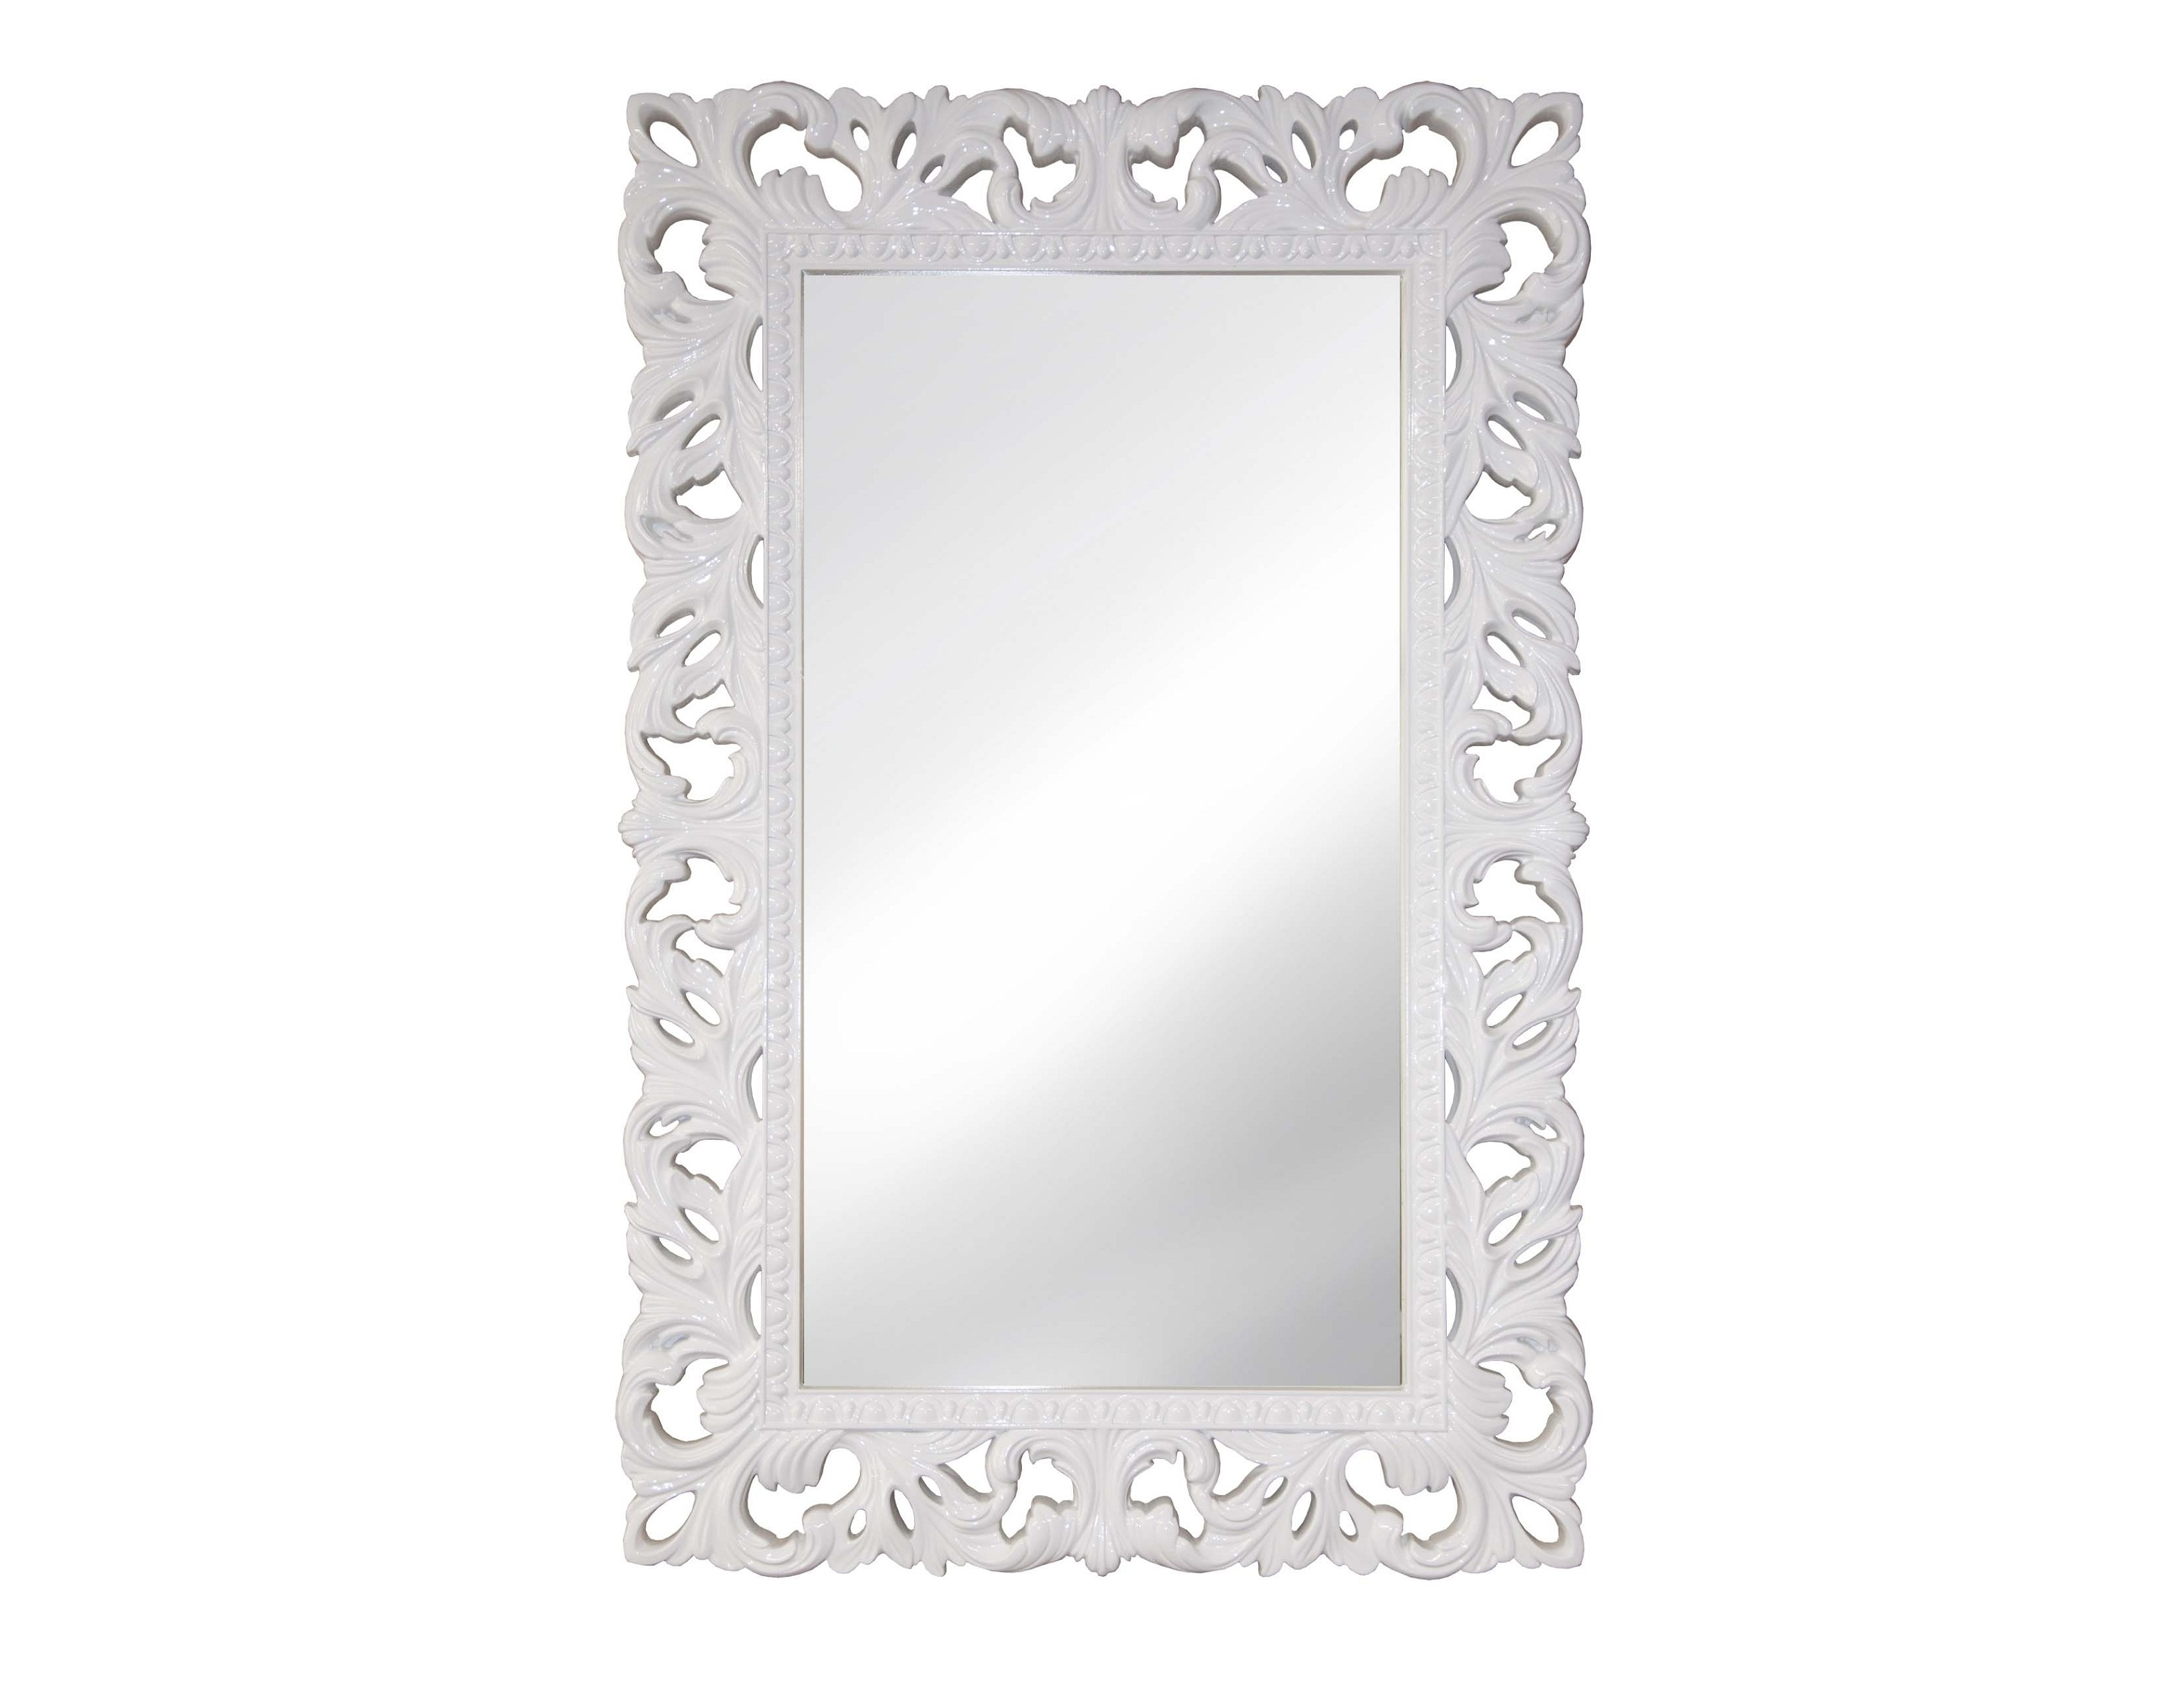 Зеркало Reeforma 15445019 от thefurnish